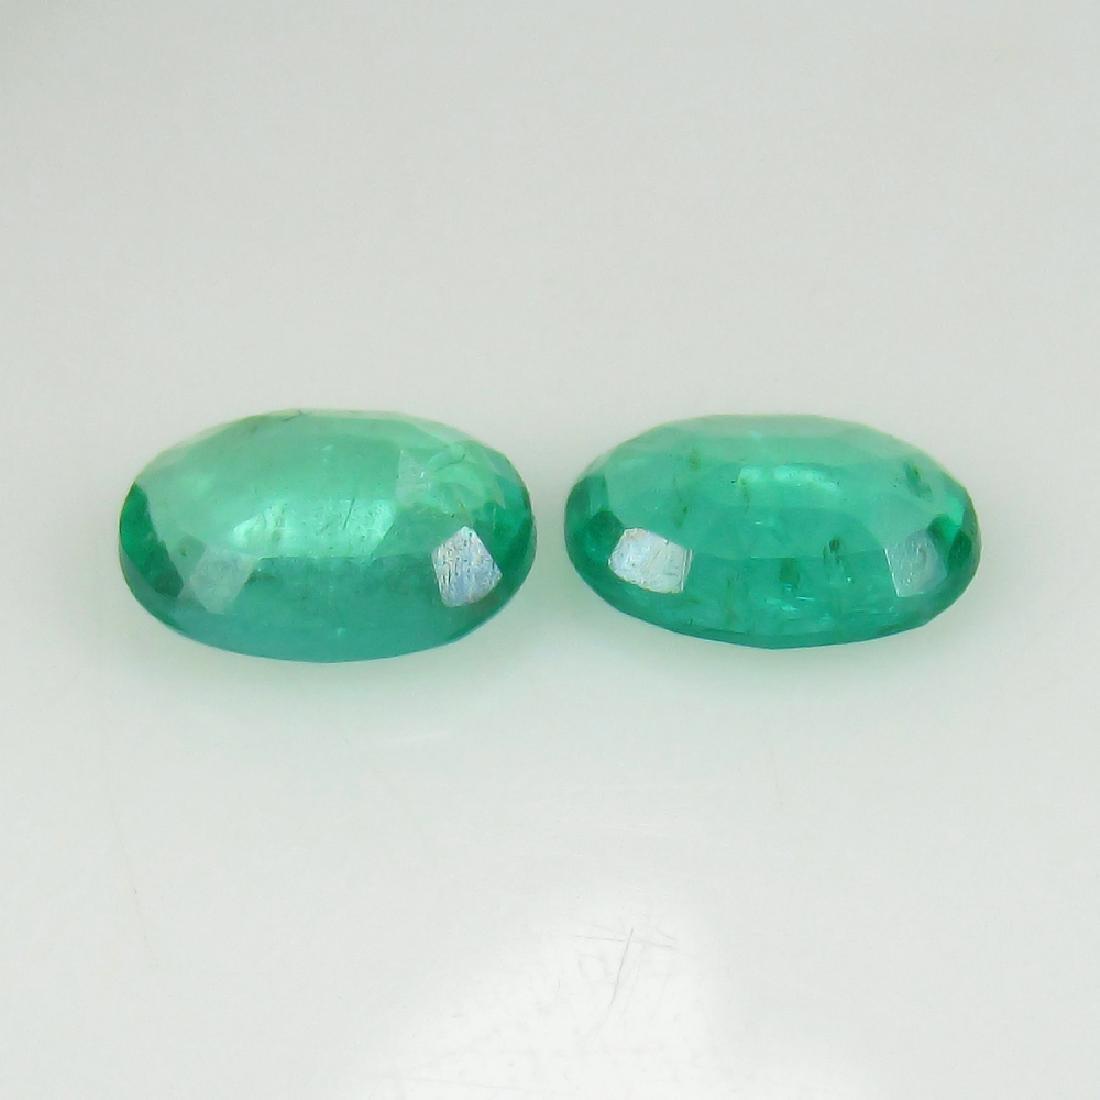 1.35 Ct IGI Certified Genuine Zambian Emerald Matching - 2